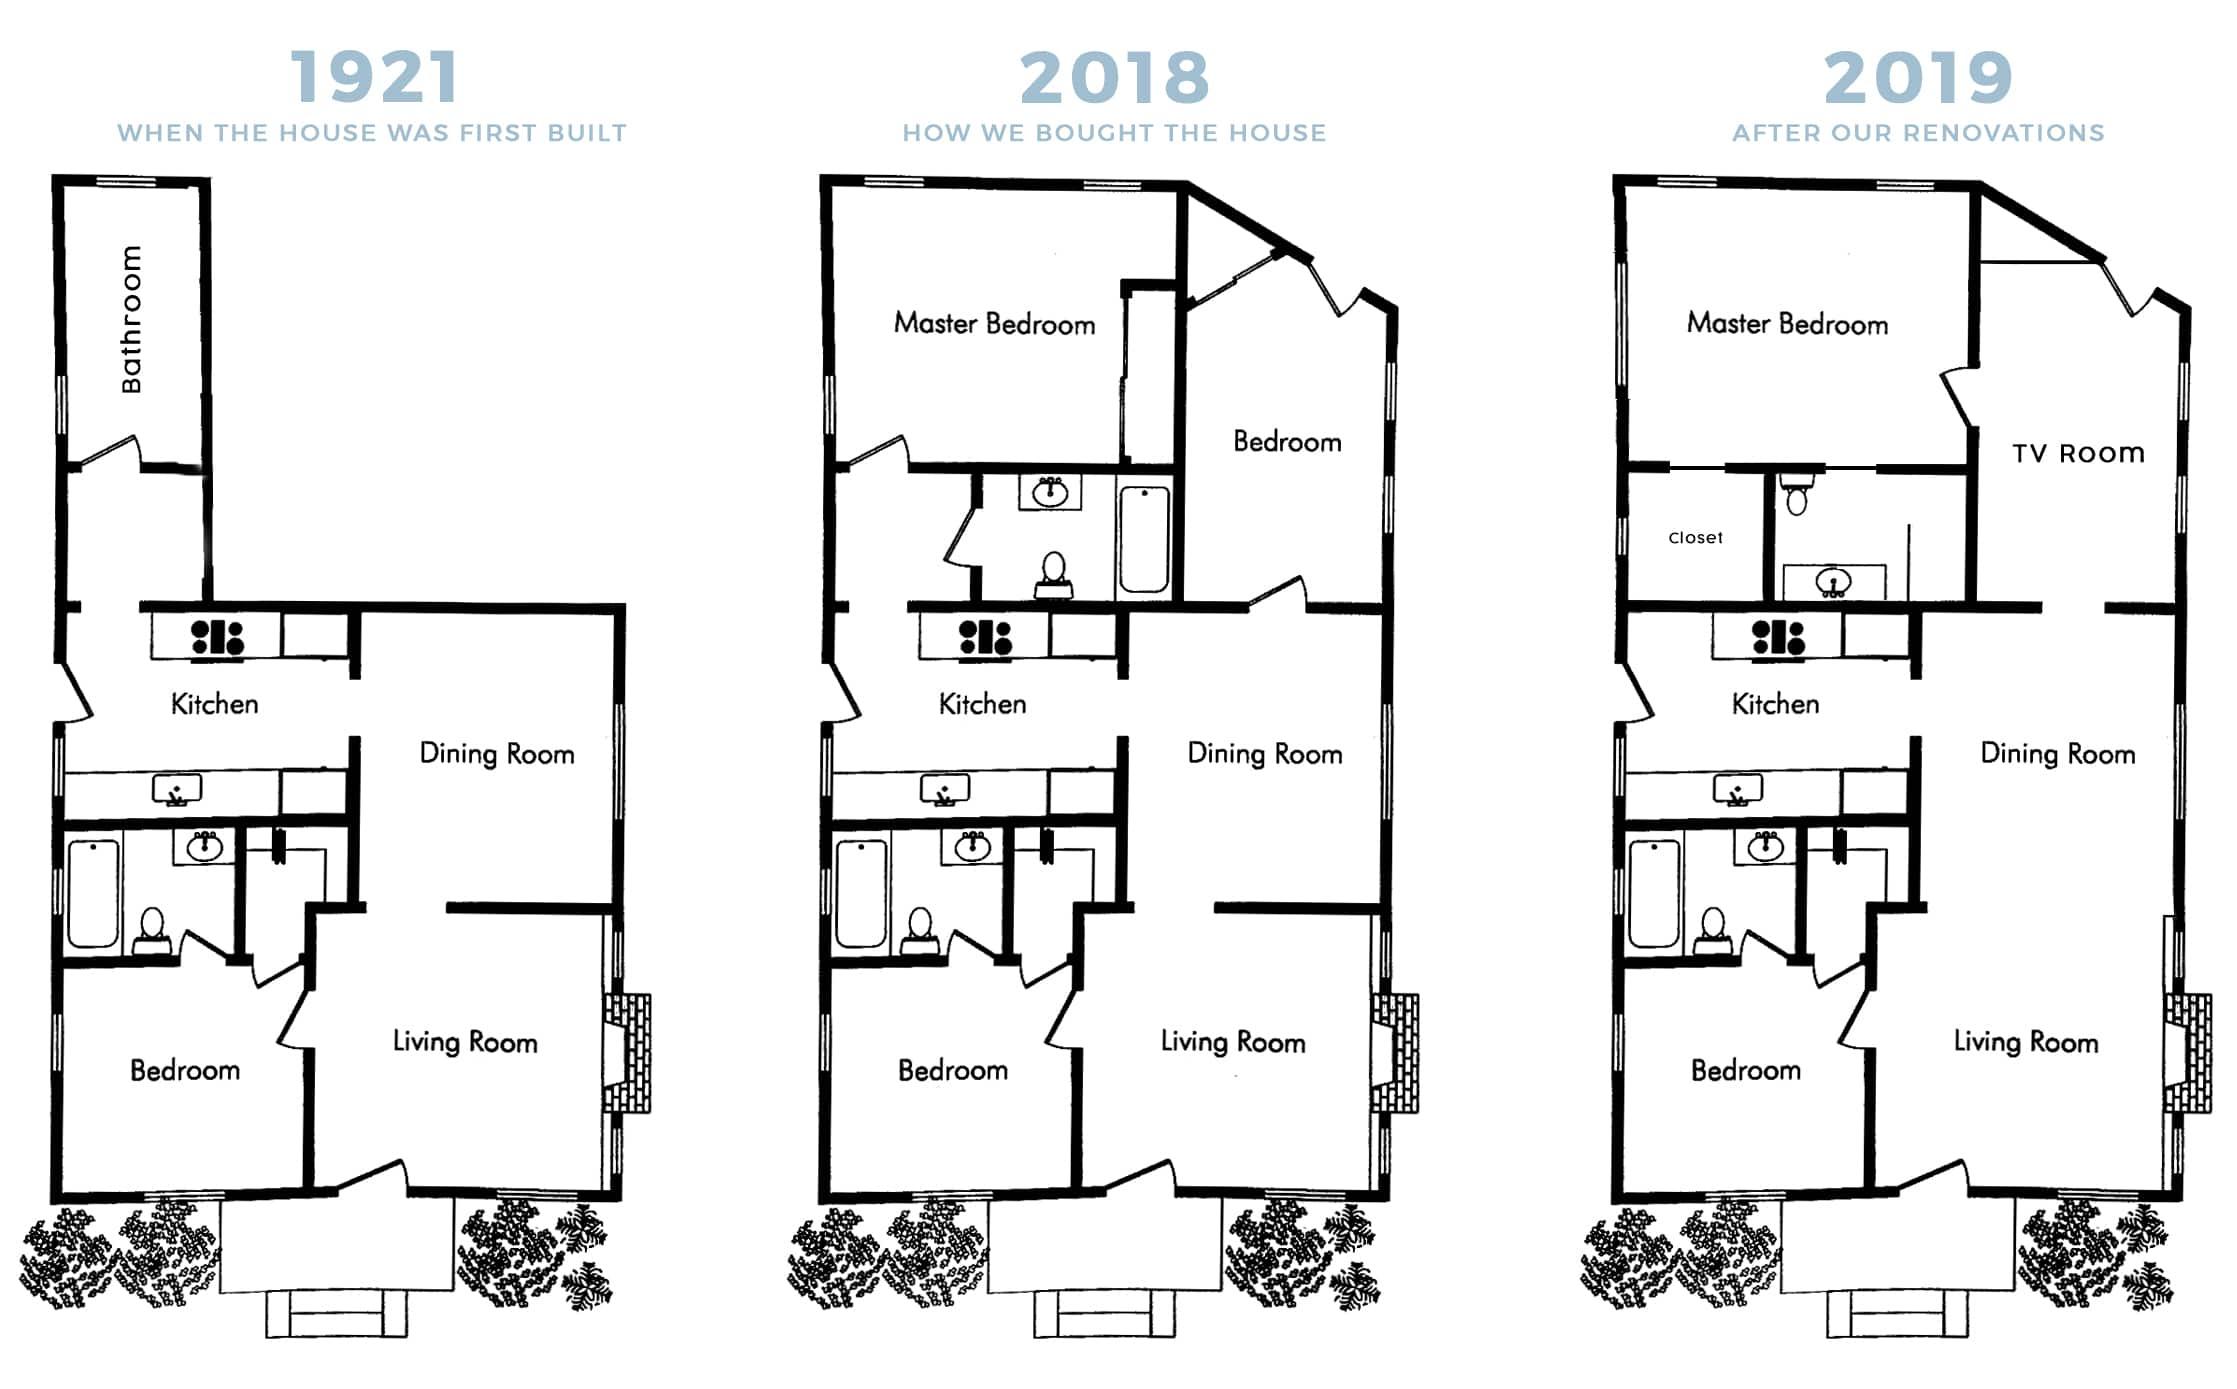 House Renovation History